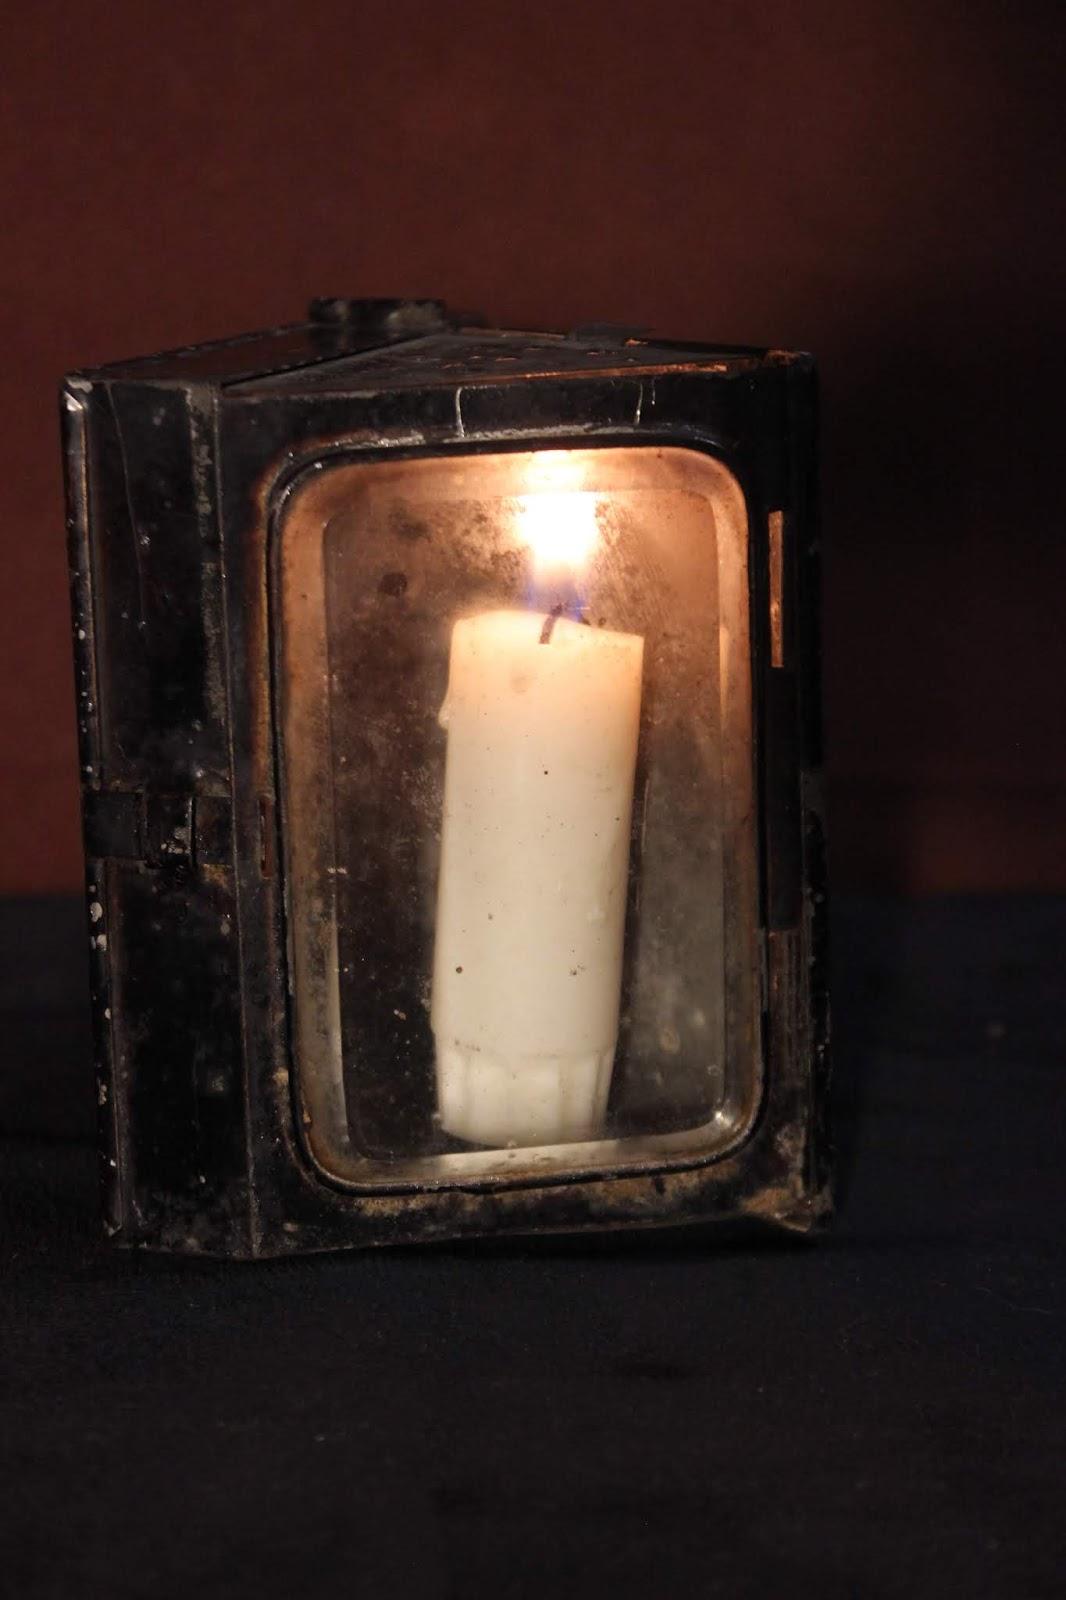 Antiques Analytical Lanterna Antica Bronzo Dorato Lamps Vintage Anni 50-60